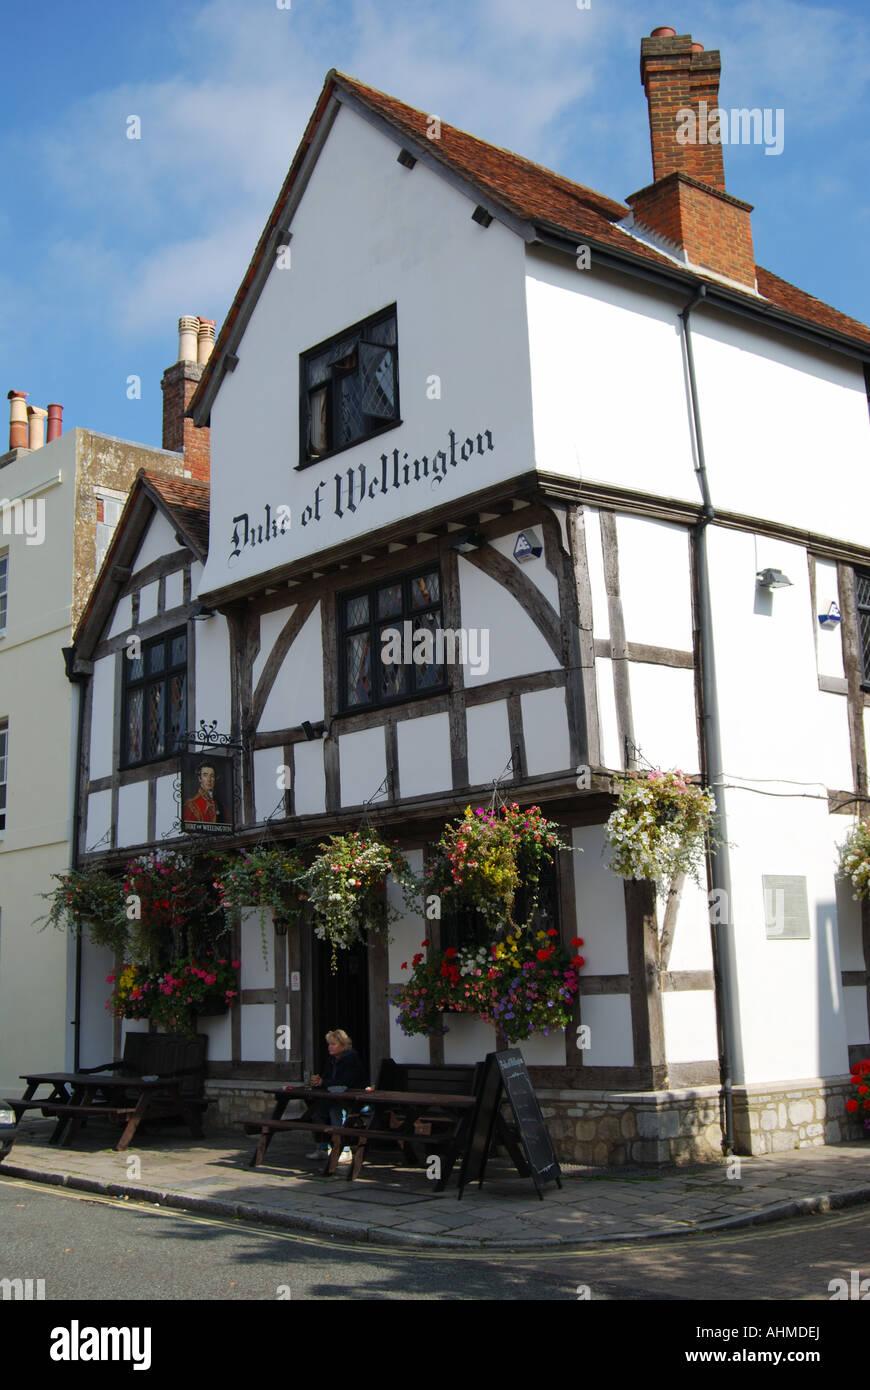 13th century Duke of Wellington Pub, Southampton, Hampshire, England, United Kingdom - Stock Image